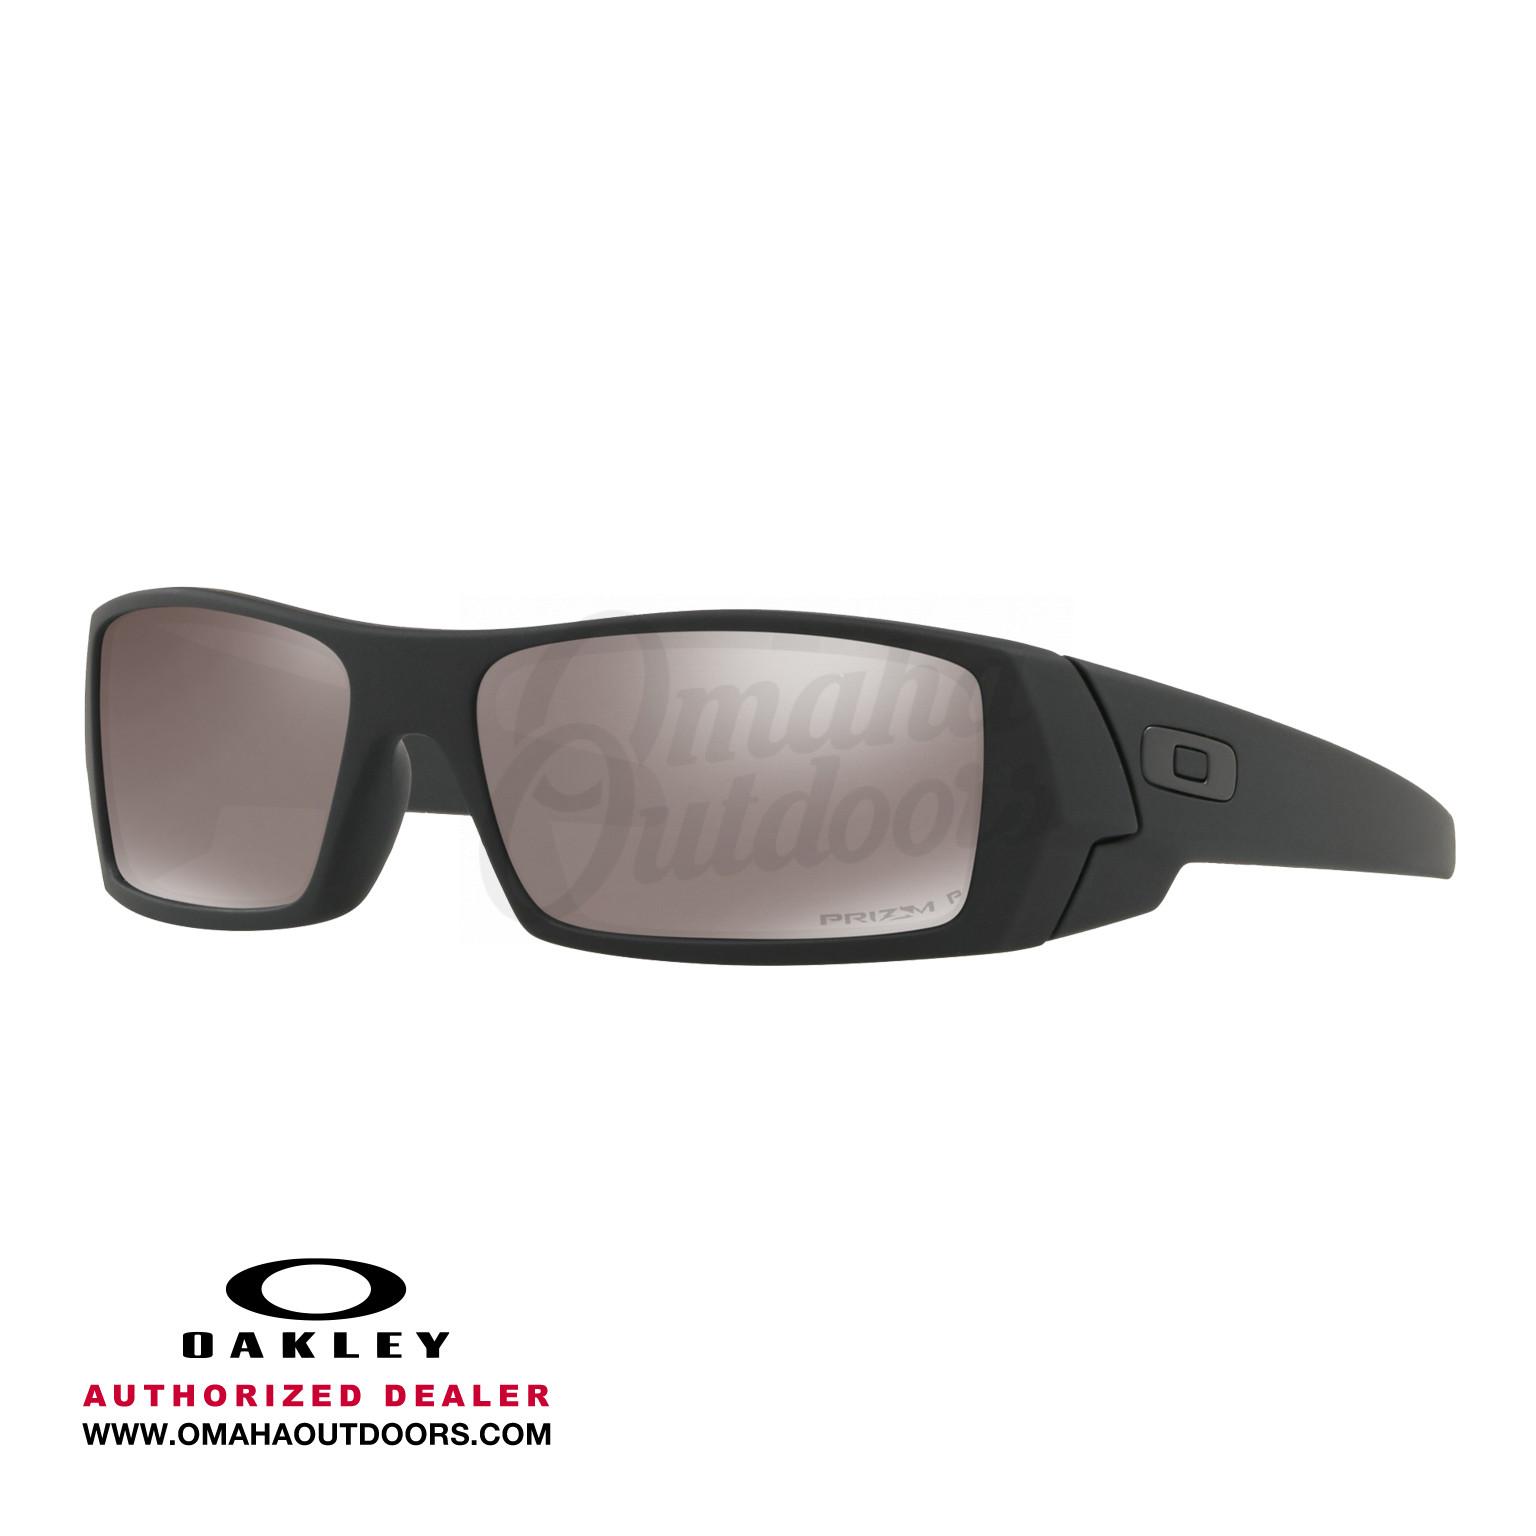 e5c35fbc0c107 Oakley SI Gascan Blackside Sunglasses Prizm Black Polarized Lens ...